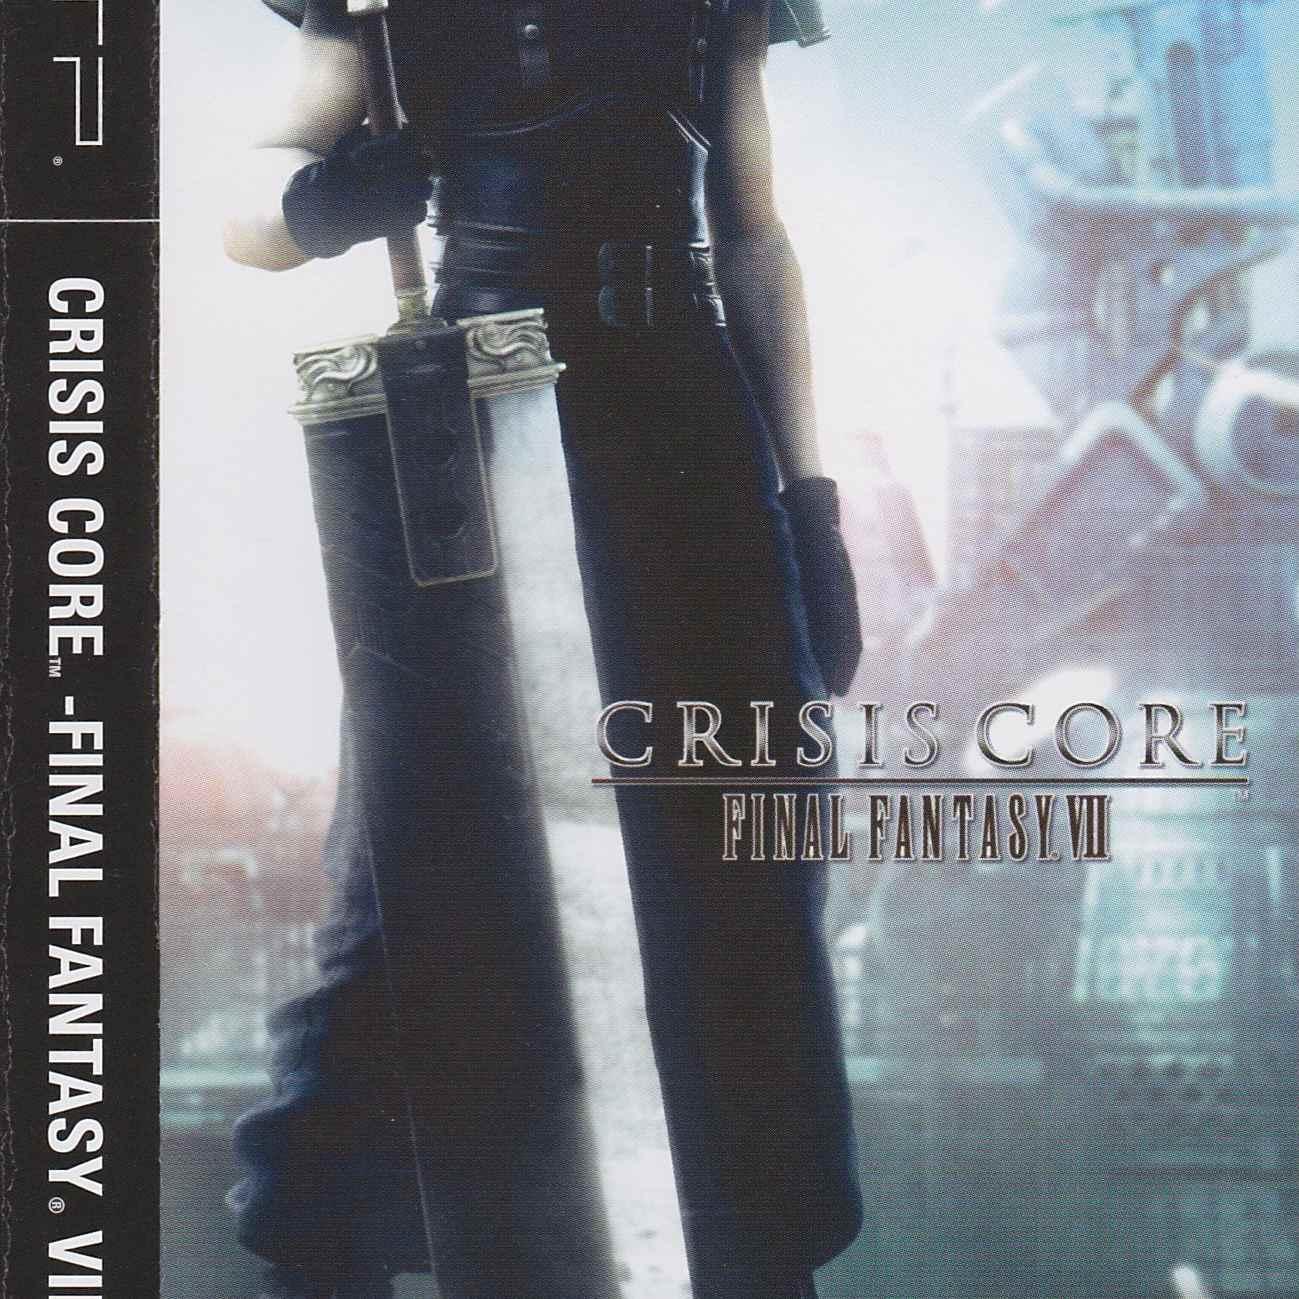 Crisis Core: Final Fantasy VII game jacket for PSP